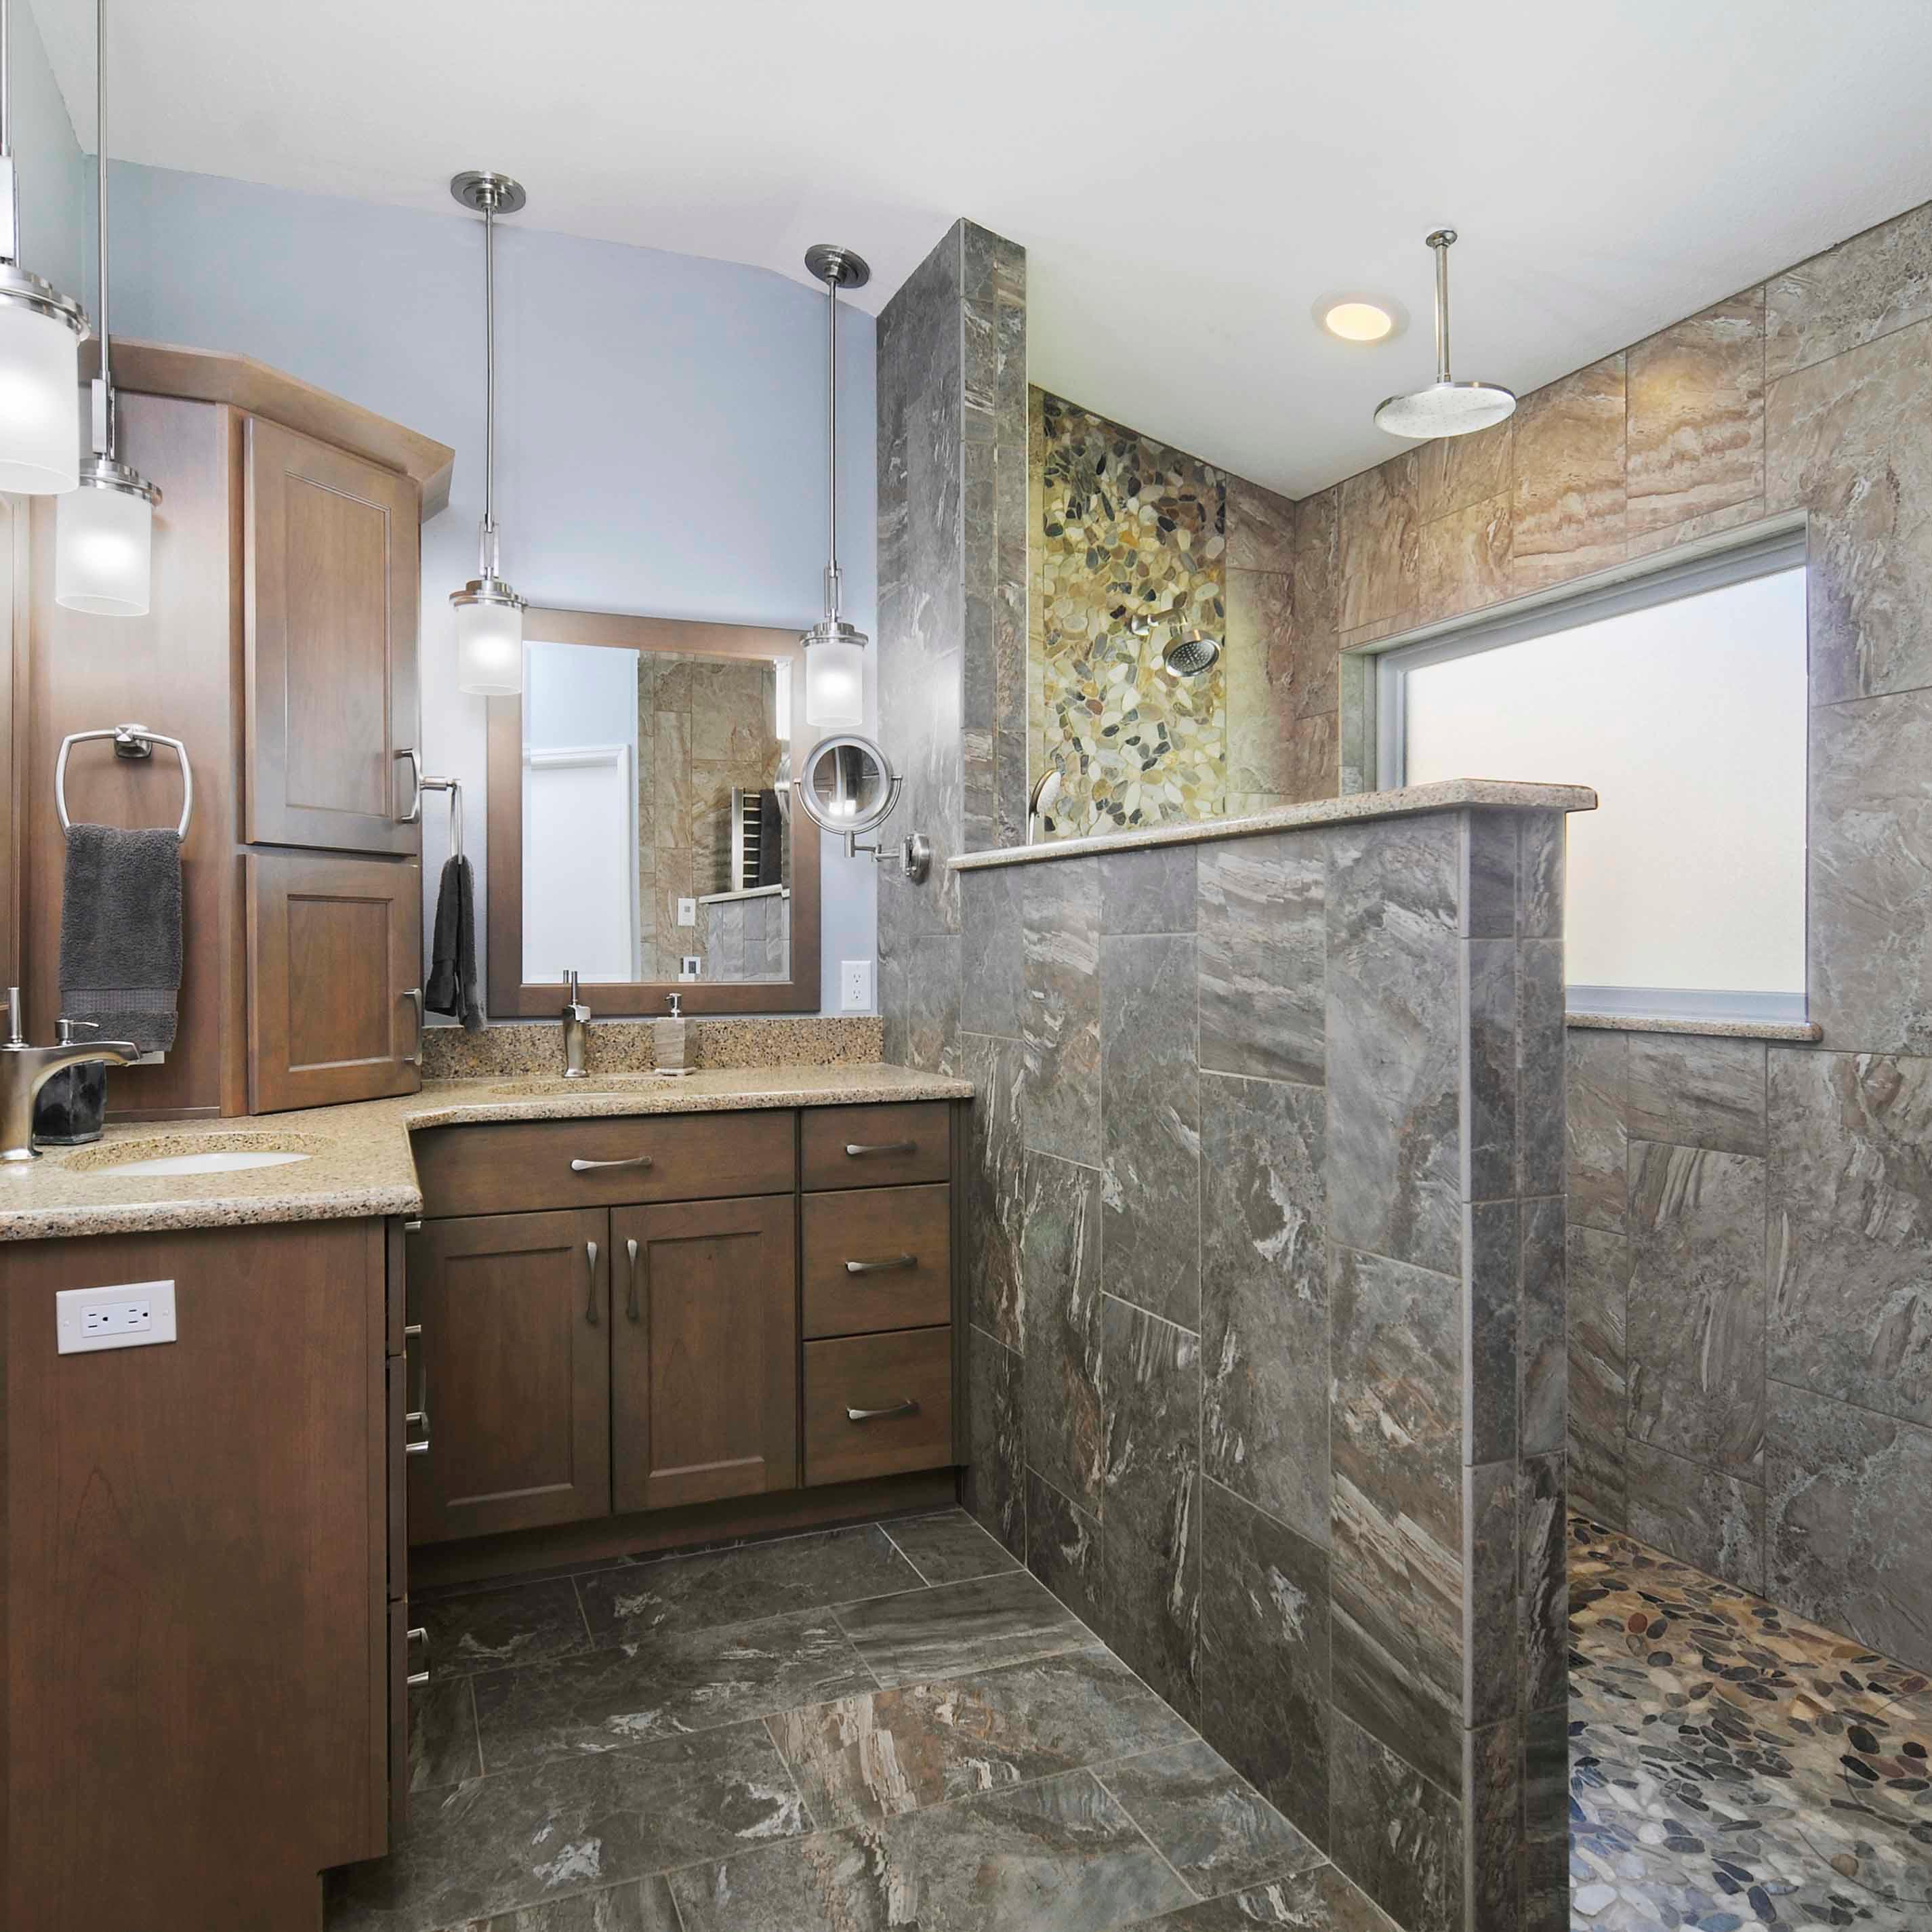 S&W Kitchens image 9